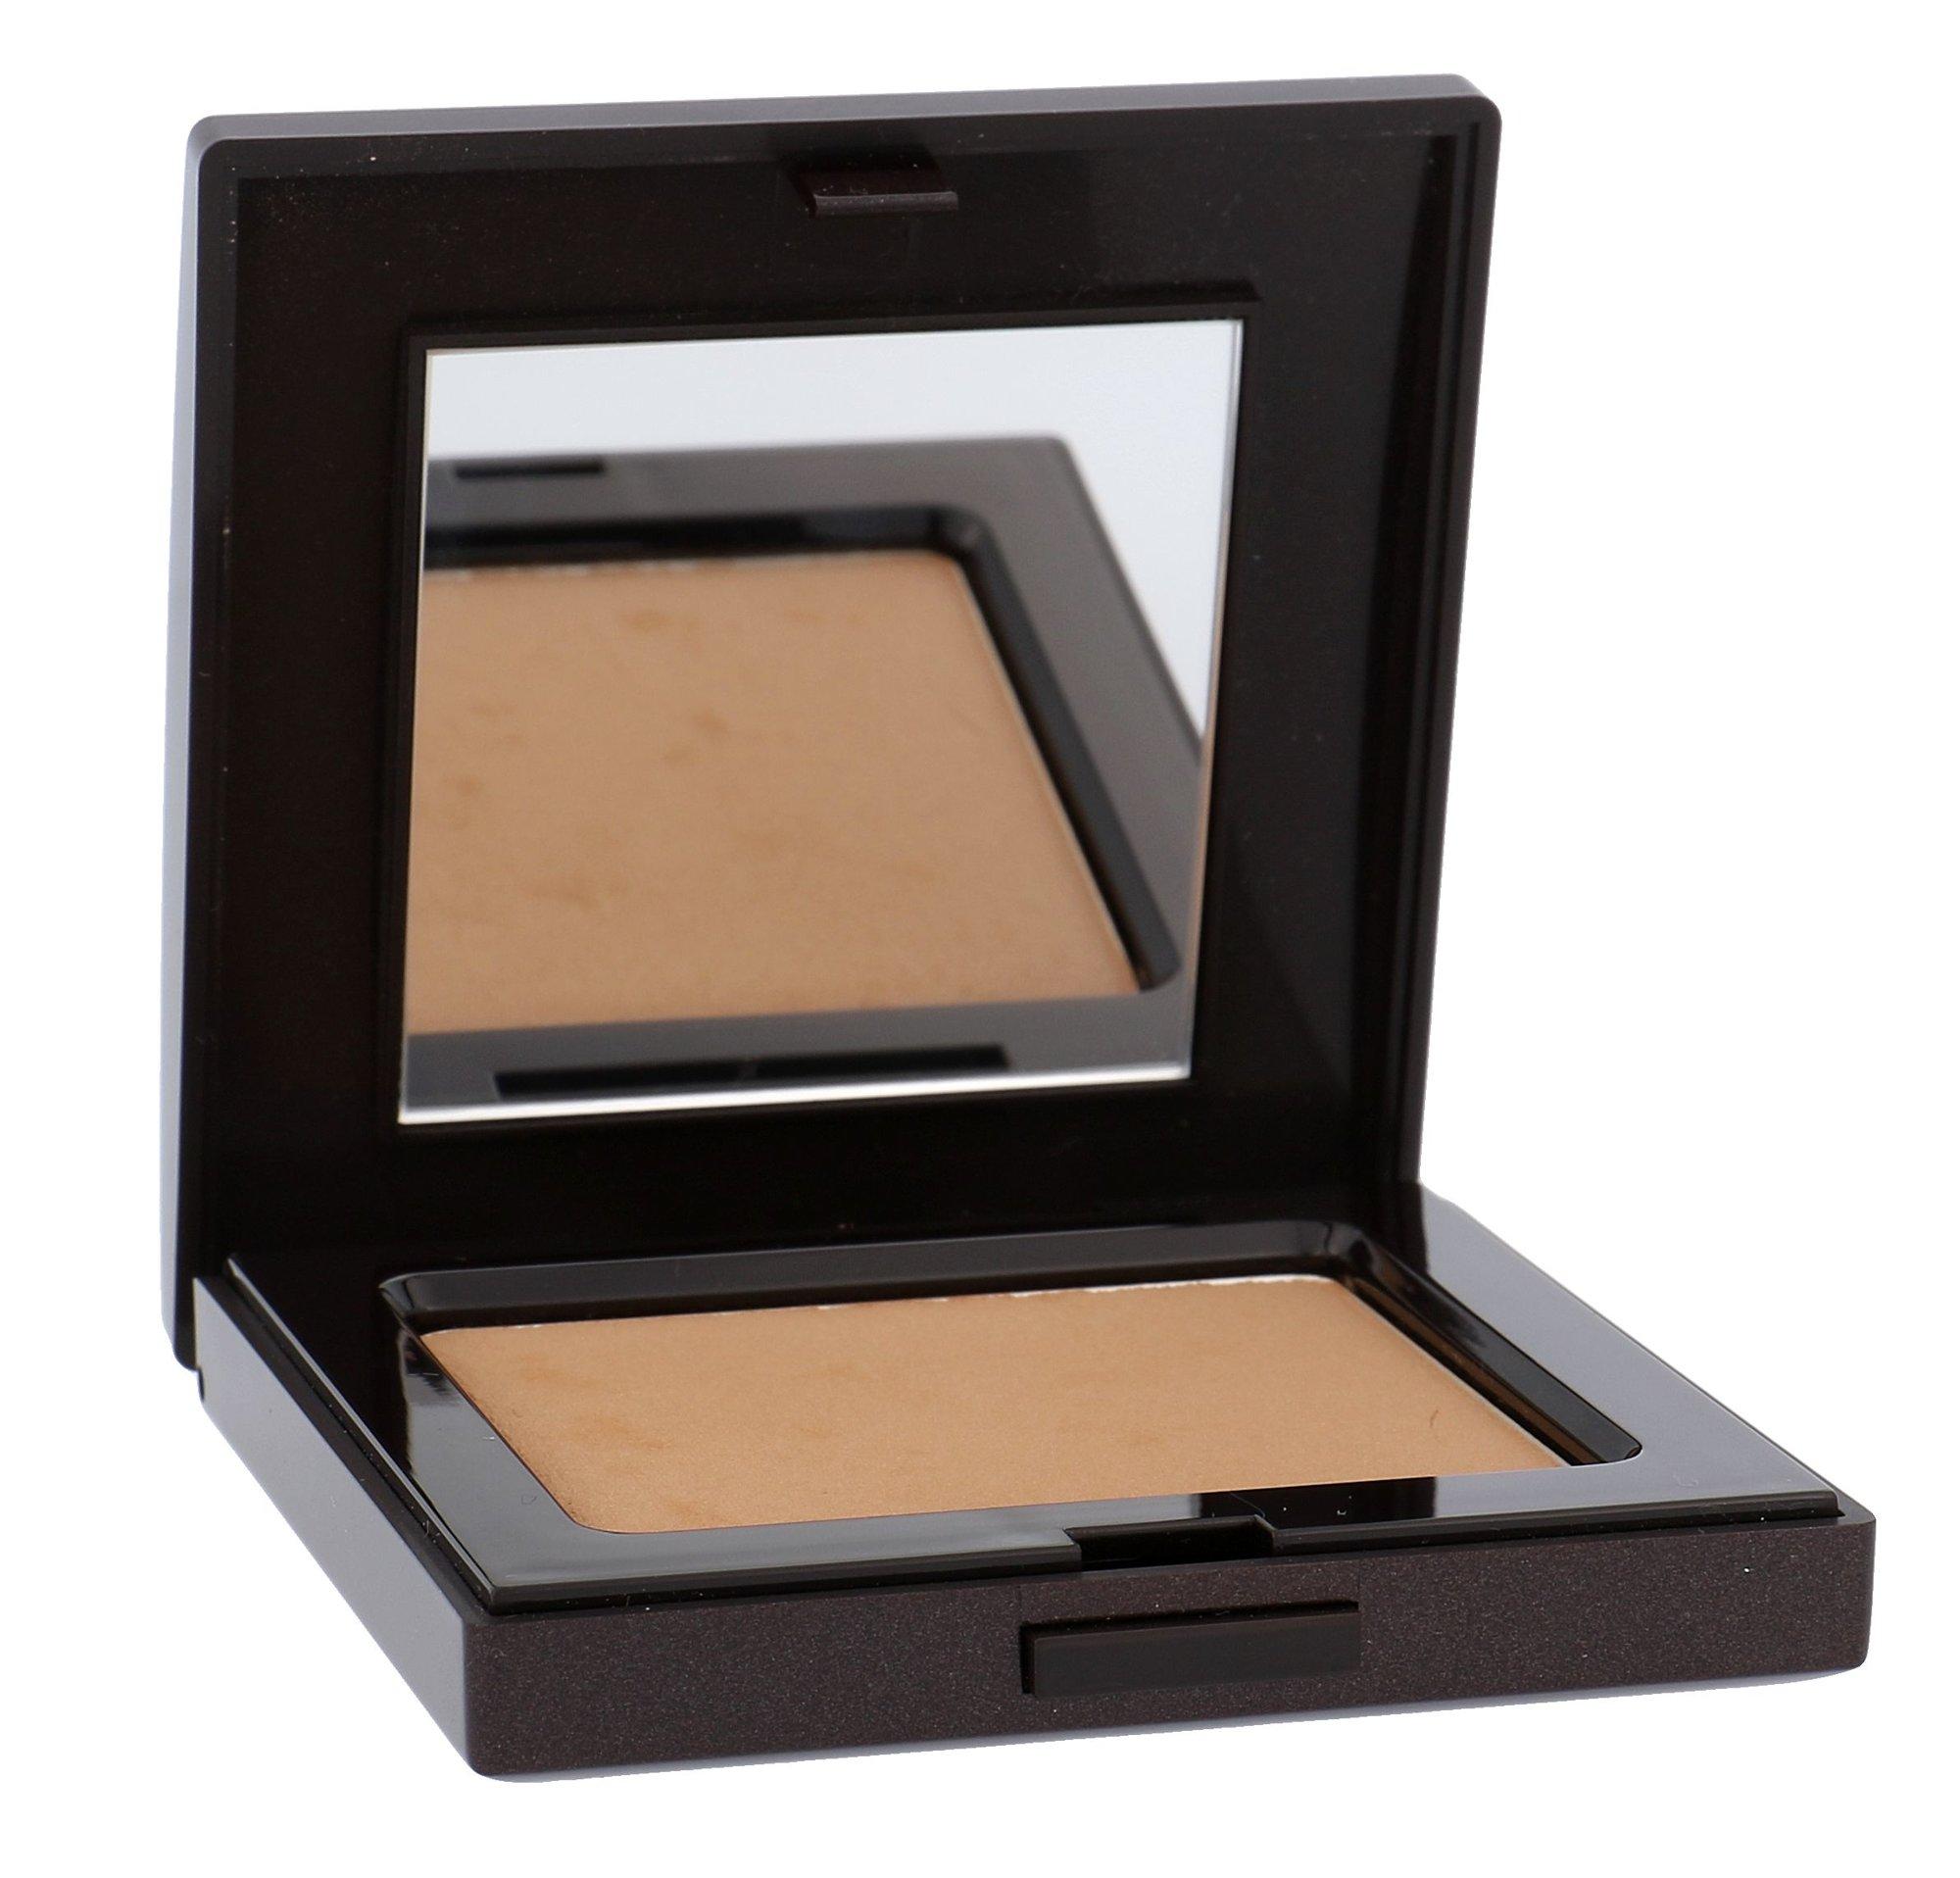 Laura Mercier Mineral Pressed Powder Cosmetic 8,1ml Golden Suntan